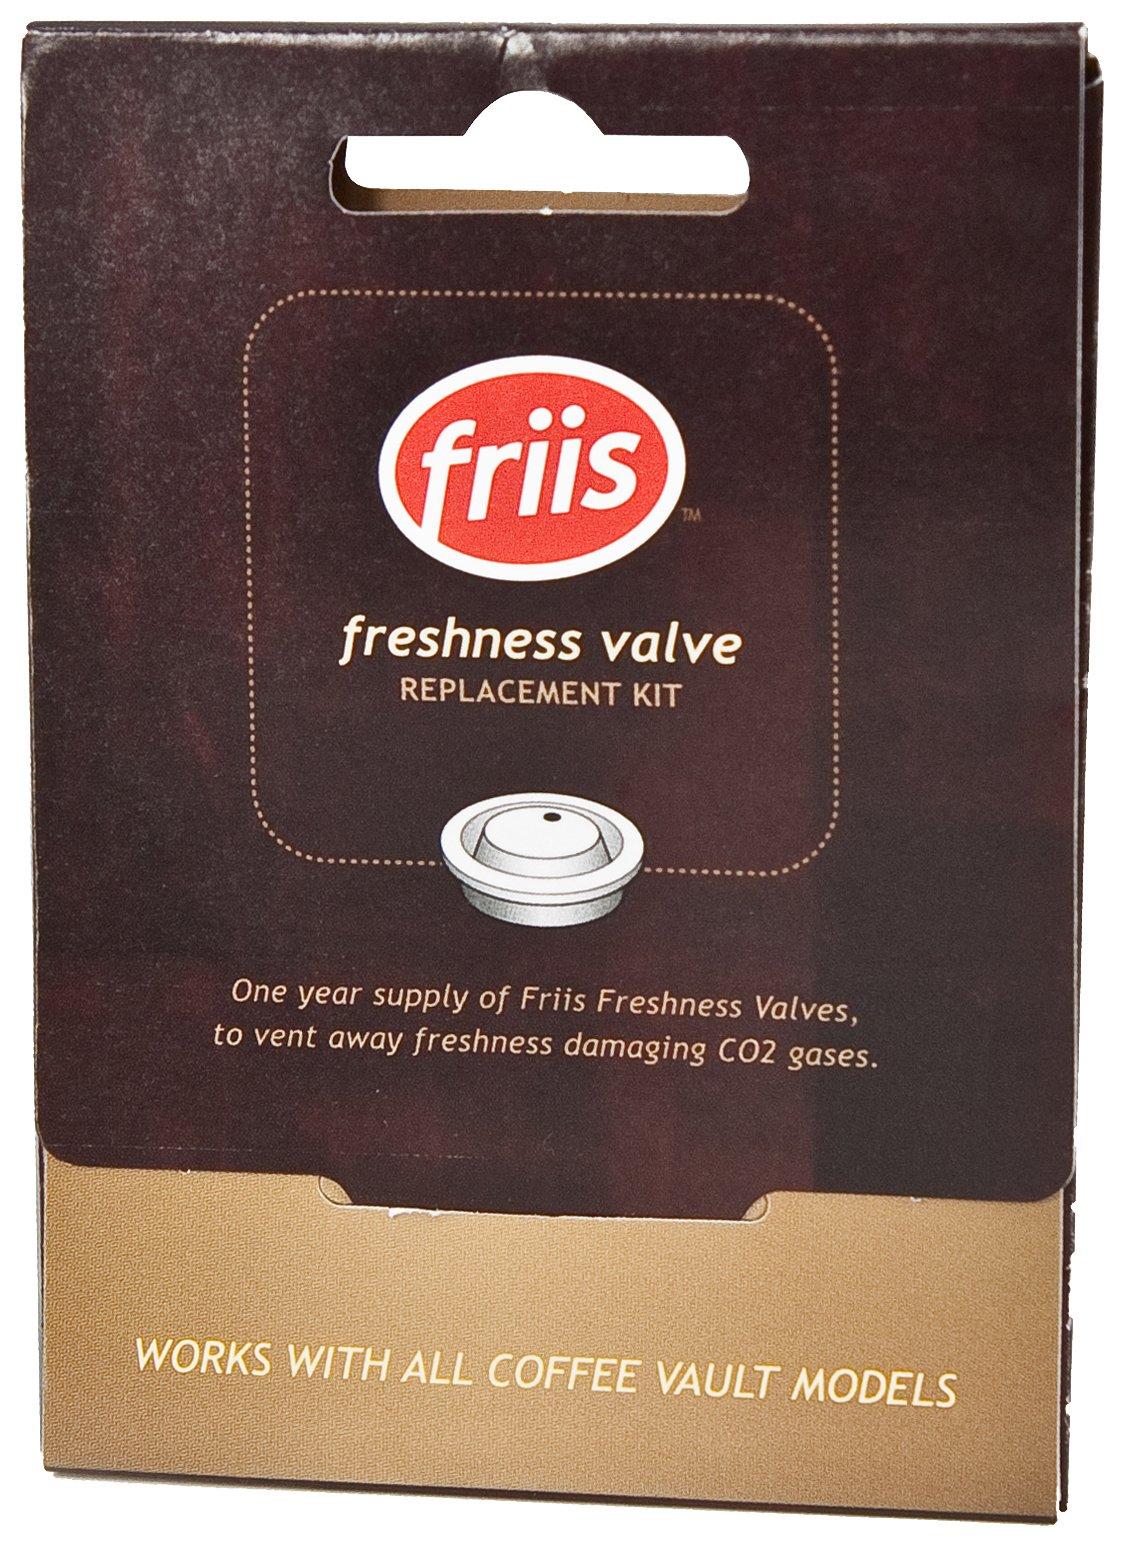 Friis Freshness Valve Replacement Kit